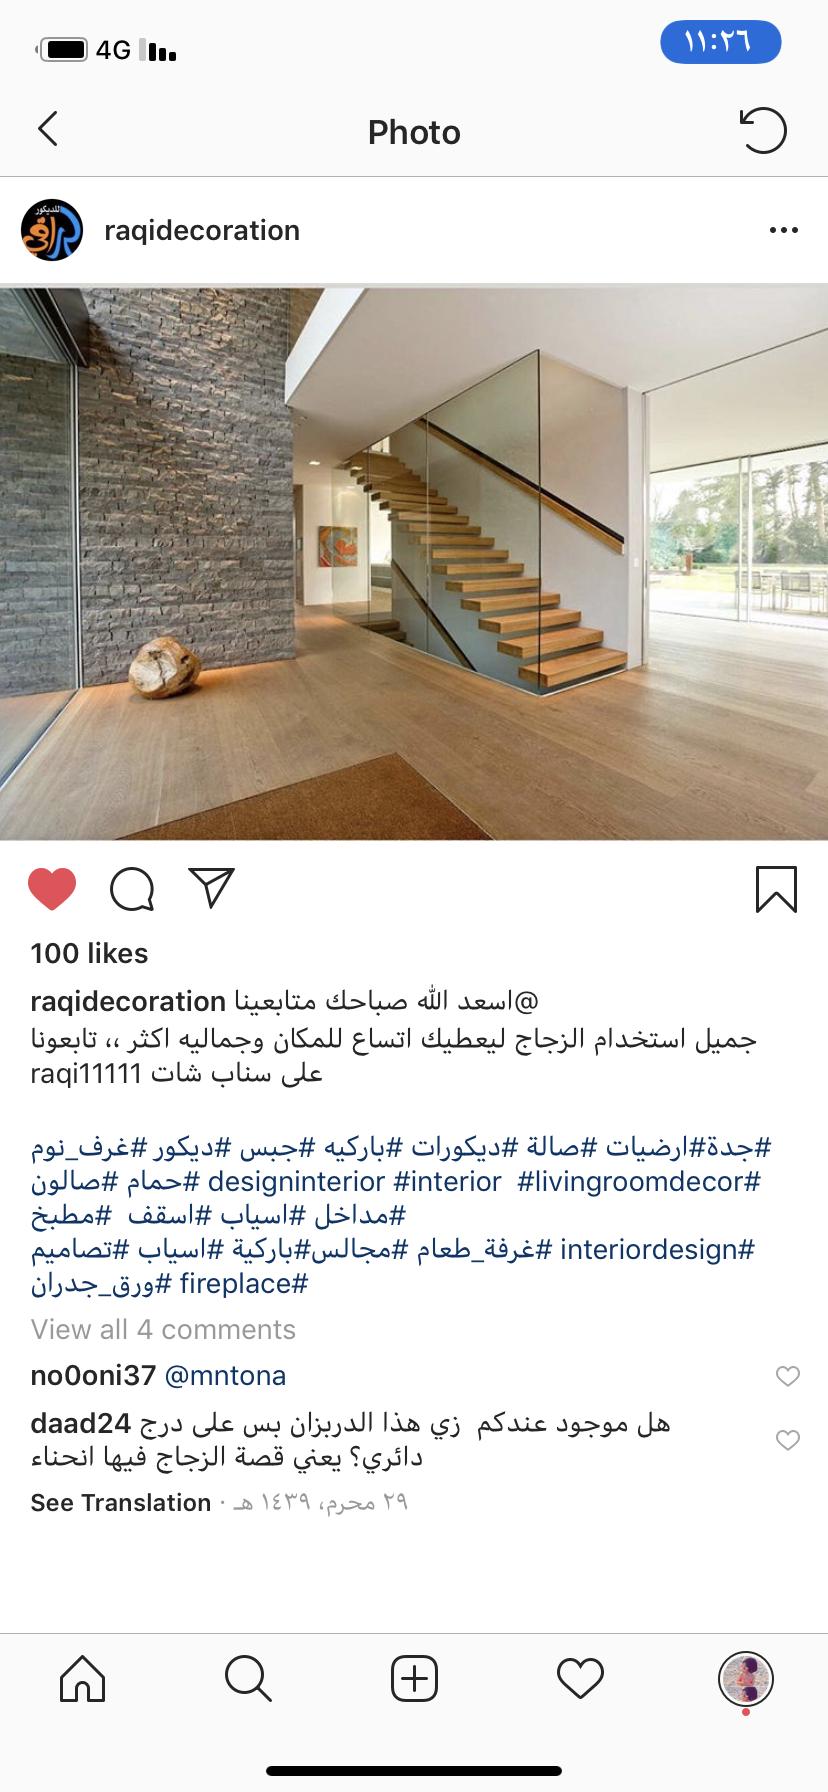 Pin By Roreta Al Qurashi On General Decoration Living Room Decor Interior Design Interior